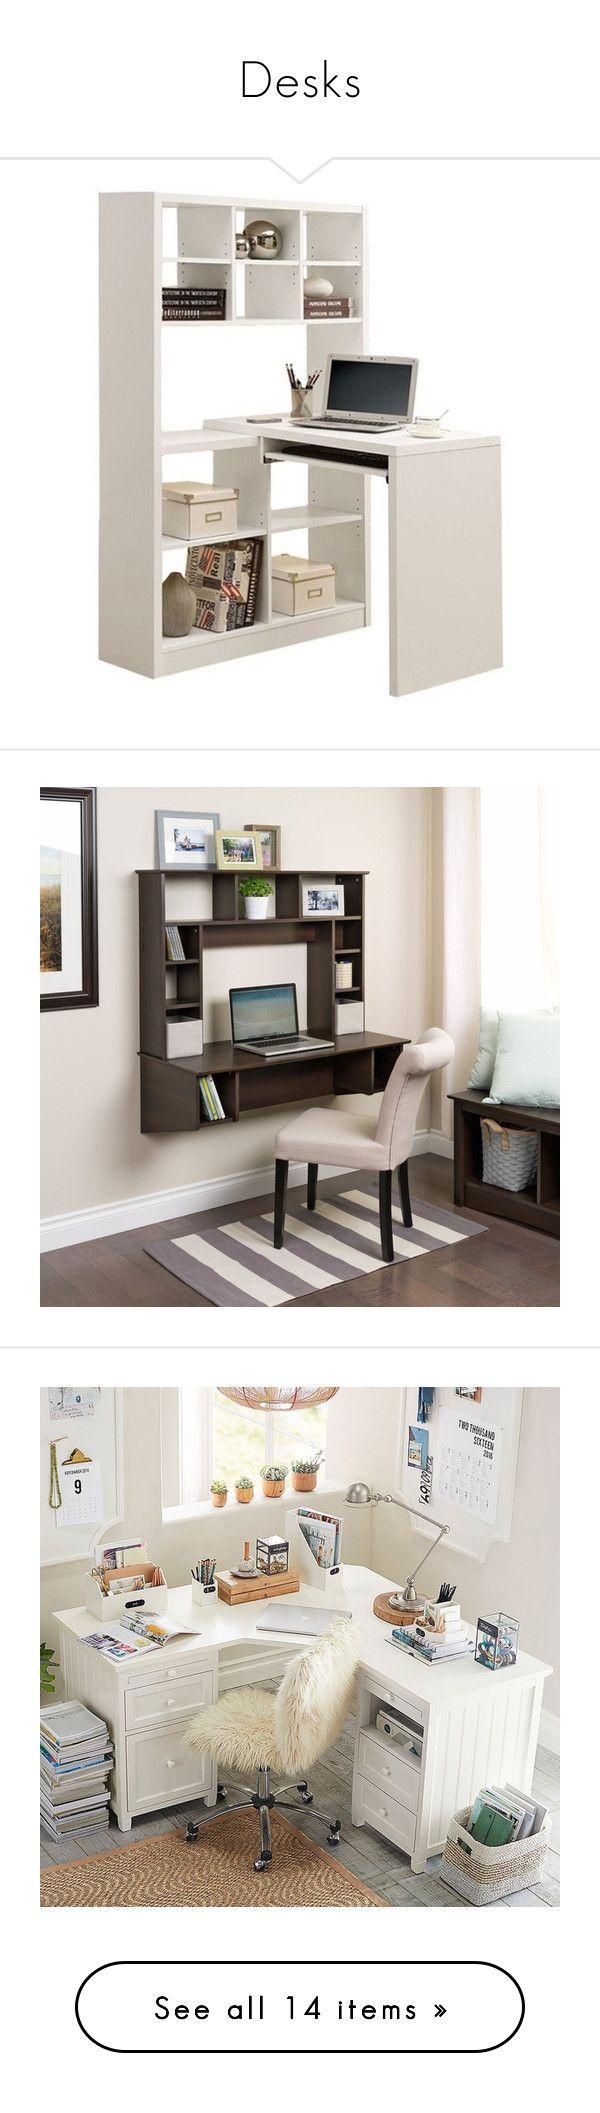 """Desks"" by deborah-97 ❤ liked on Polyvore featuring home, furniture, desks, white, white corner computer desk, computer desk, corner computer desk, white home office desk, white corner desk and brown"